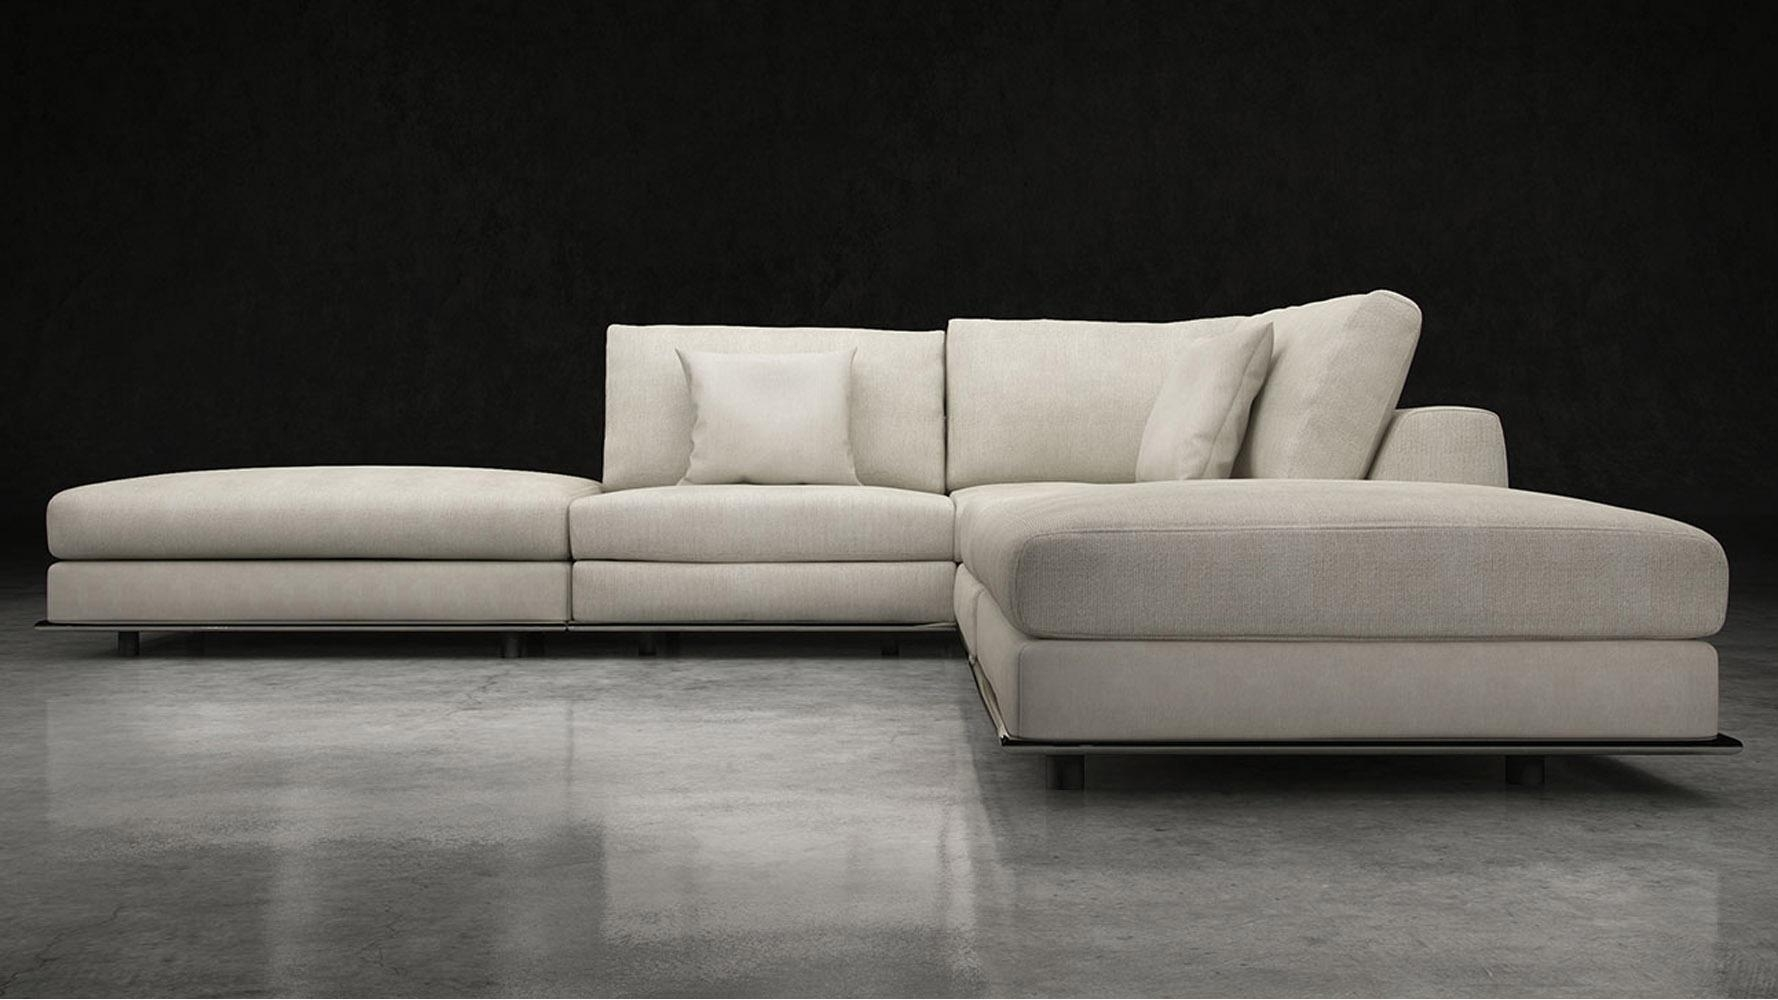 Modern Persis Armless Corner Sectional Sofa – Moonbeam | Zuri Regarding Armless Sectional Sofa (View 3 of 15)